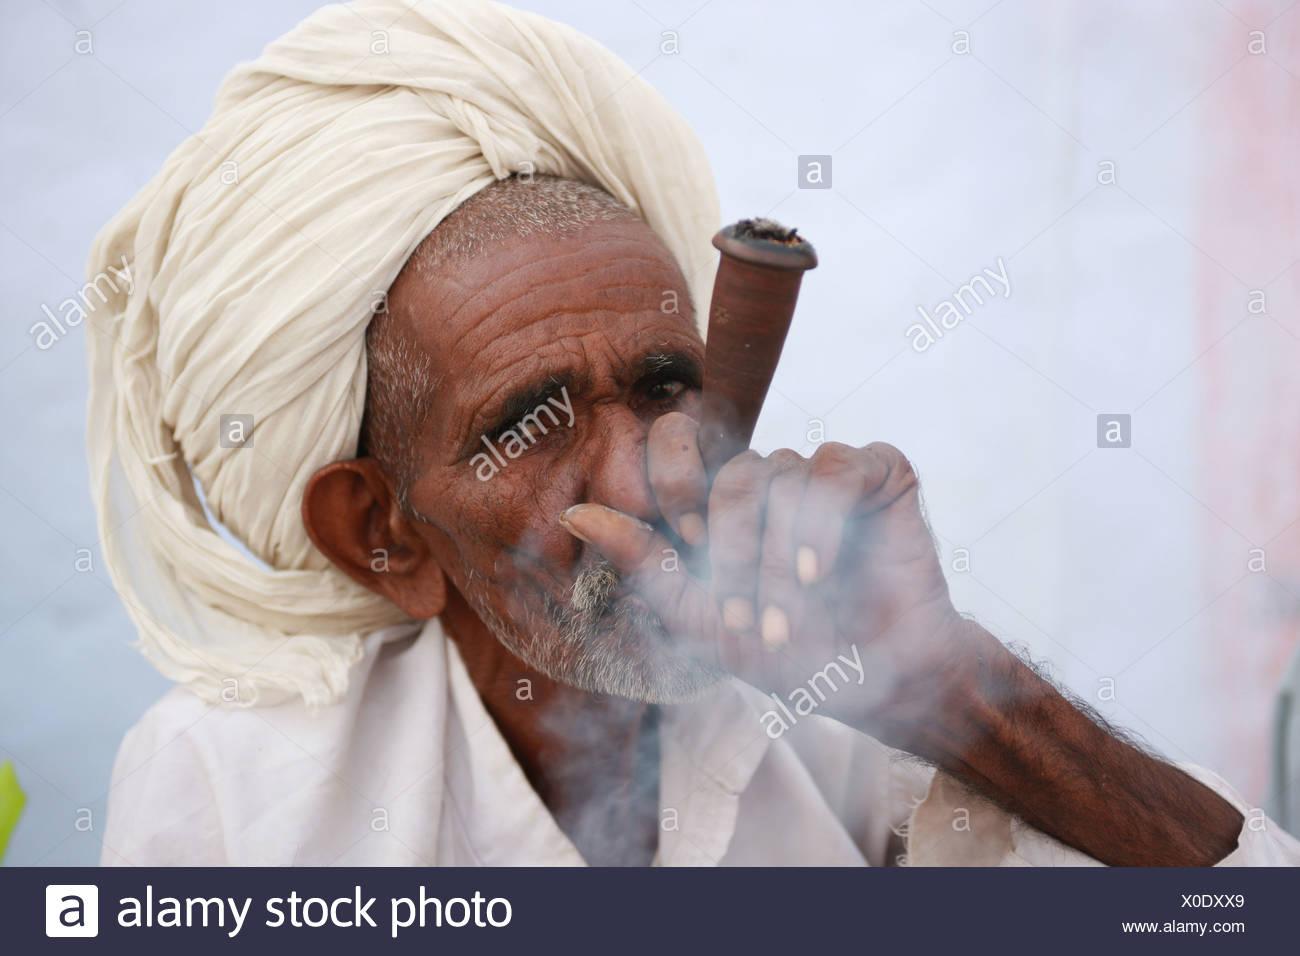 Ganja, Pushkar, Rajasthan, India, Asia, holy man, yogi, ascet, ascetic, ashram, pilgrim, ashes, turban, flower, meditation - Stock Image